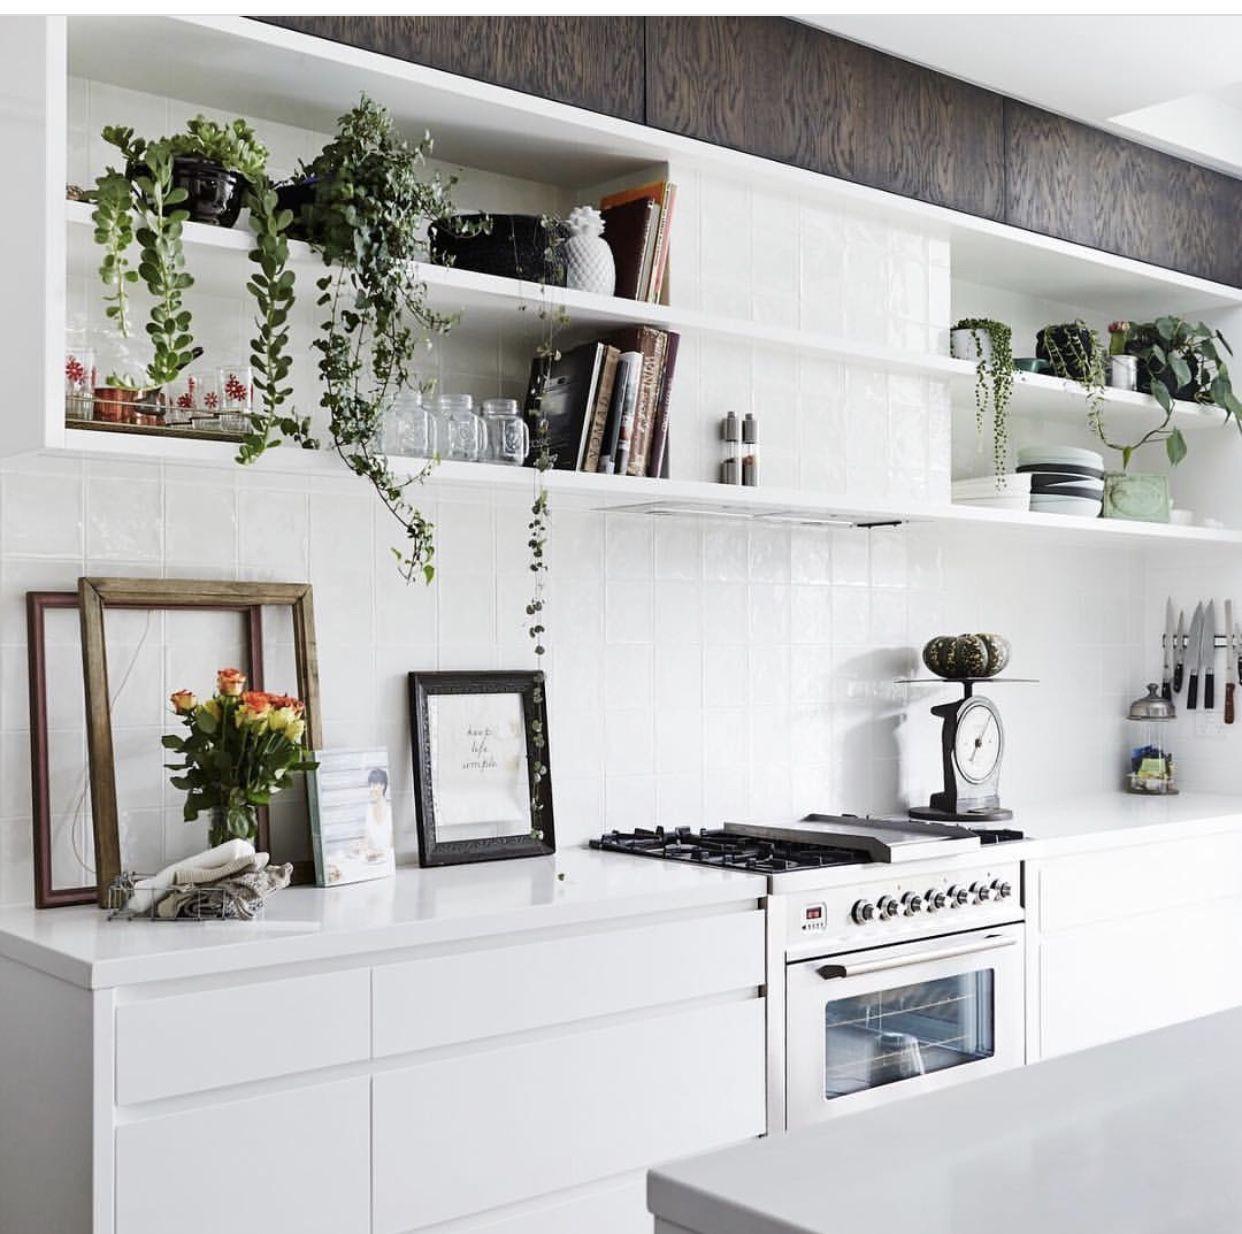 Magnolia Homes Interiors: Pin By Nicole Scott On Kitchen